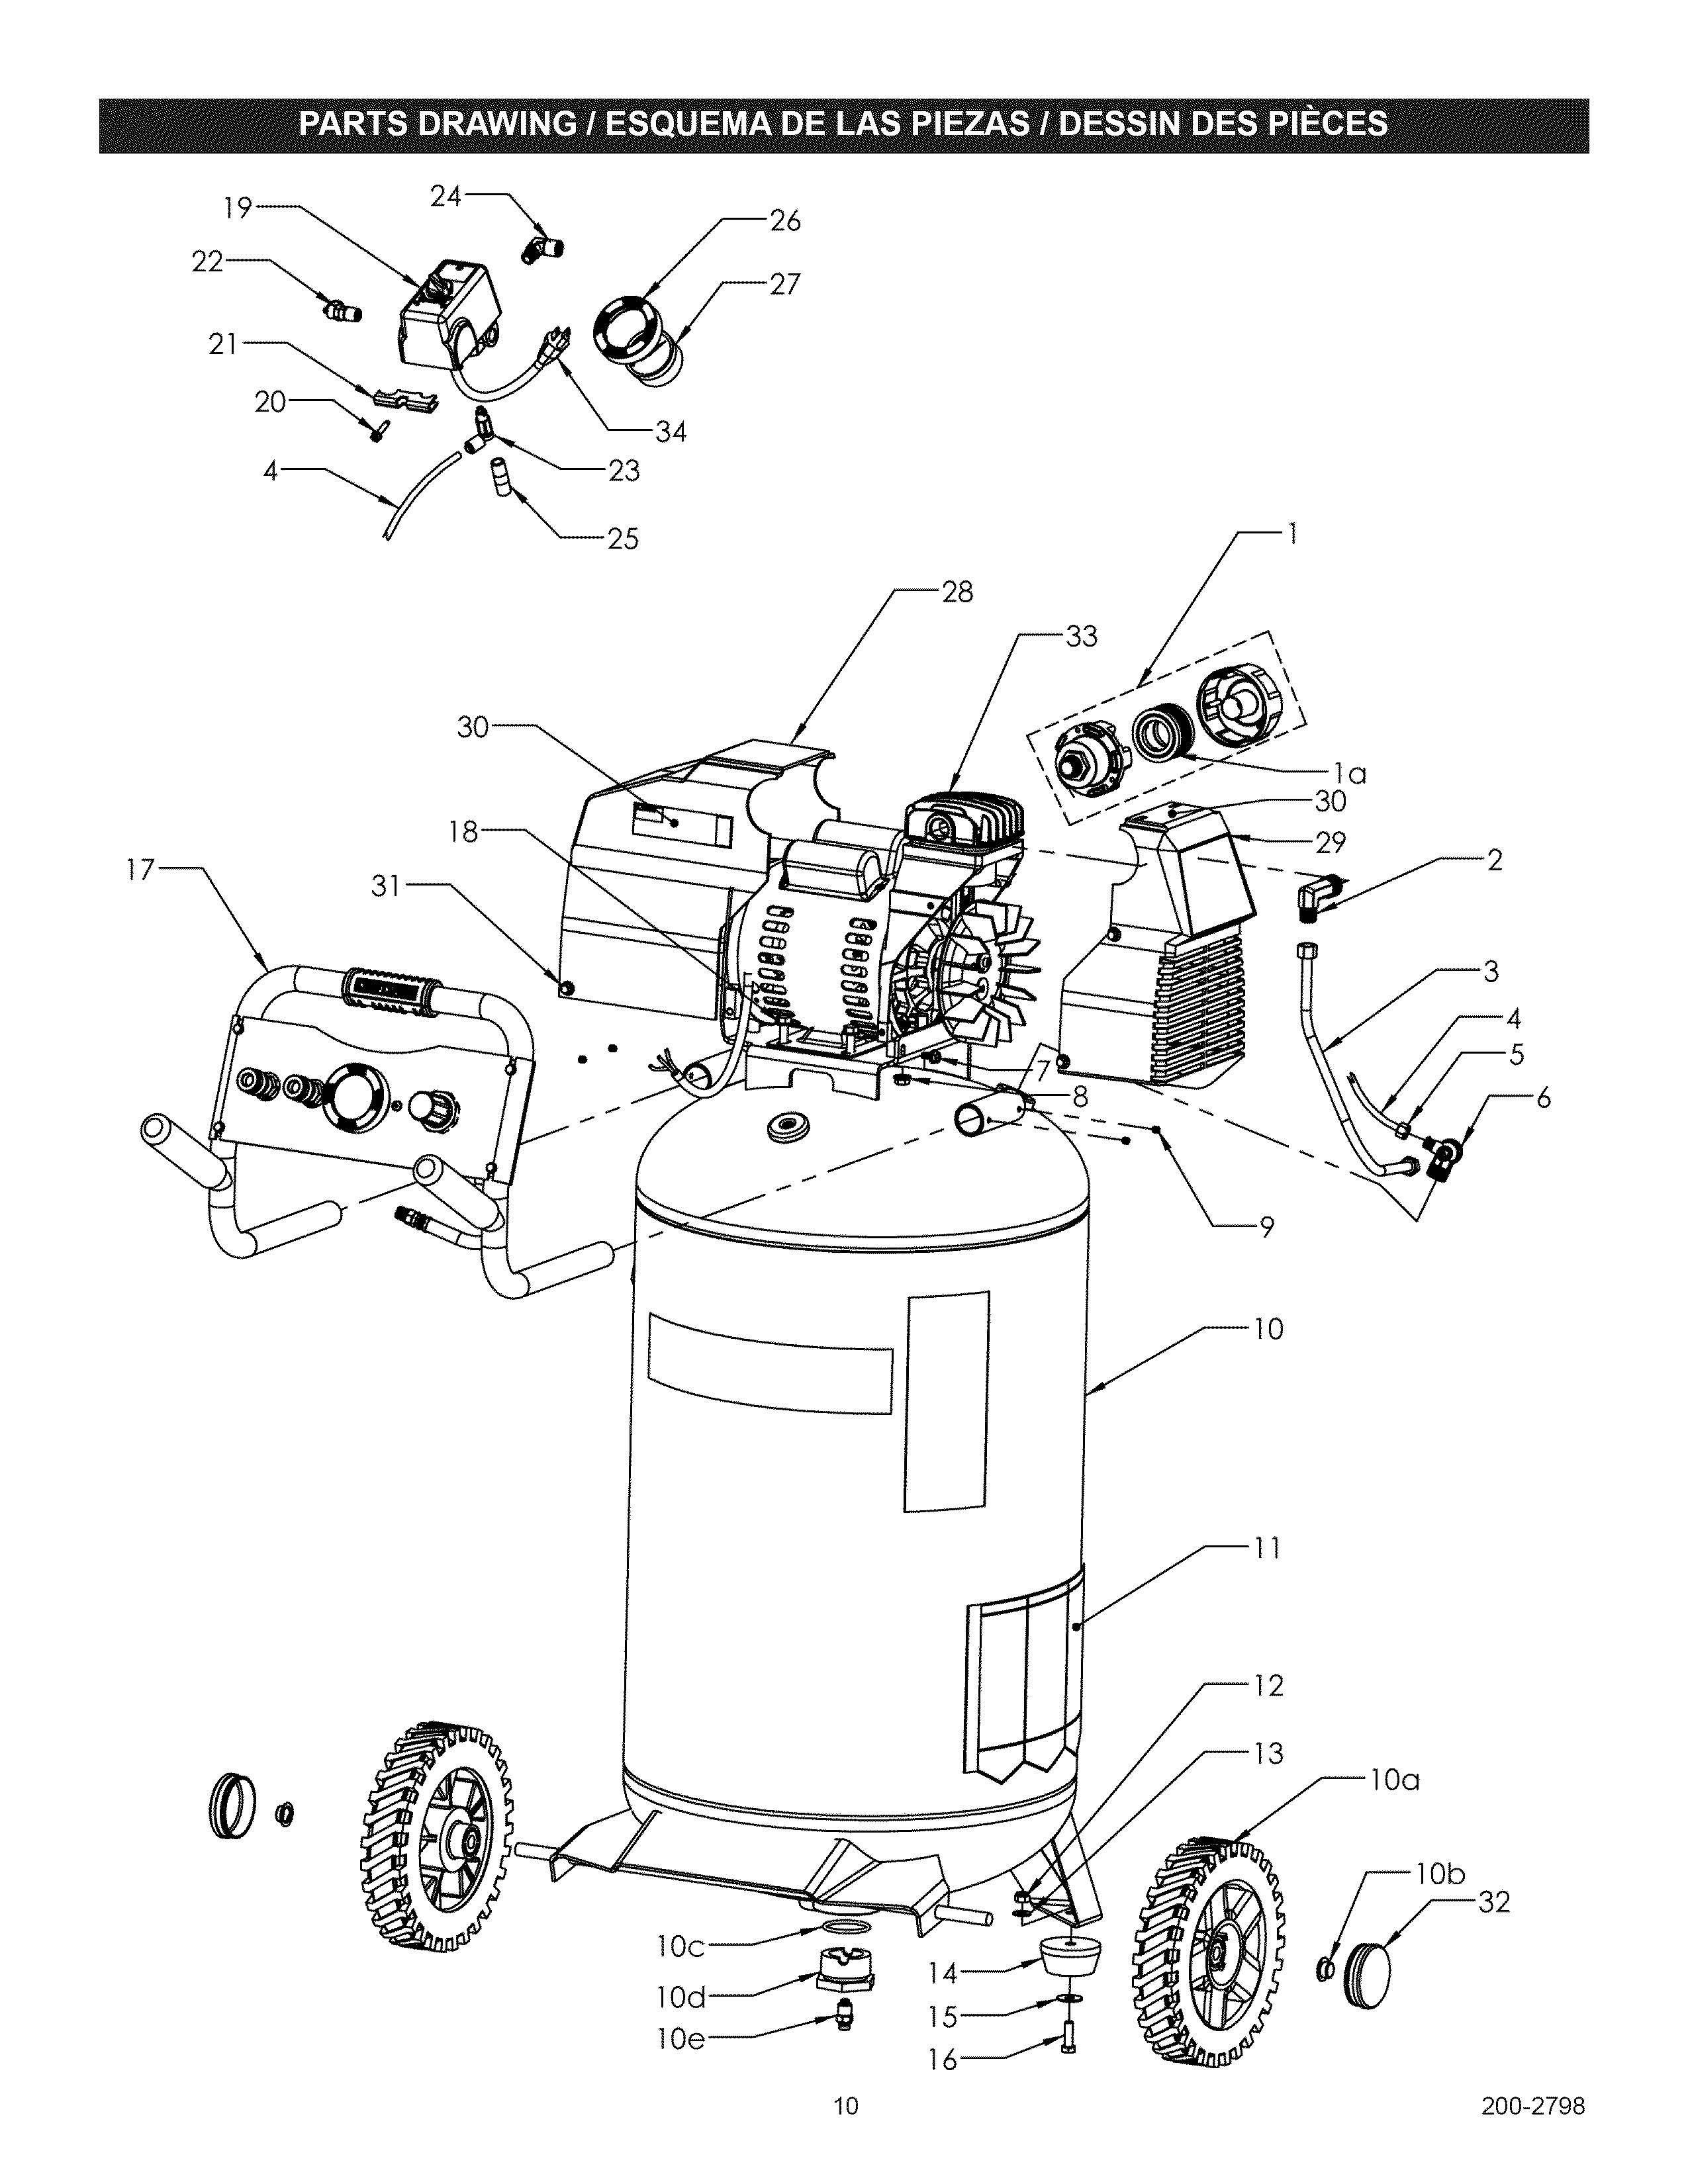 Craftsman Air Compressor Parts Diagram Beautiful Craftsman Air Pressor Sketch Electrical Diagram Ideas Of Craftsman Air Compressor Parts Diagram